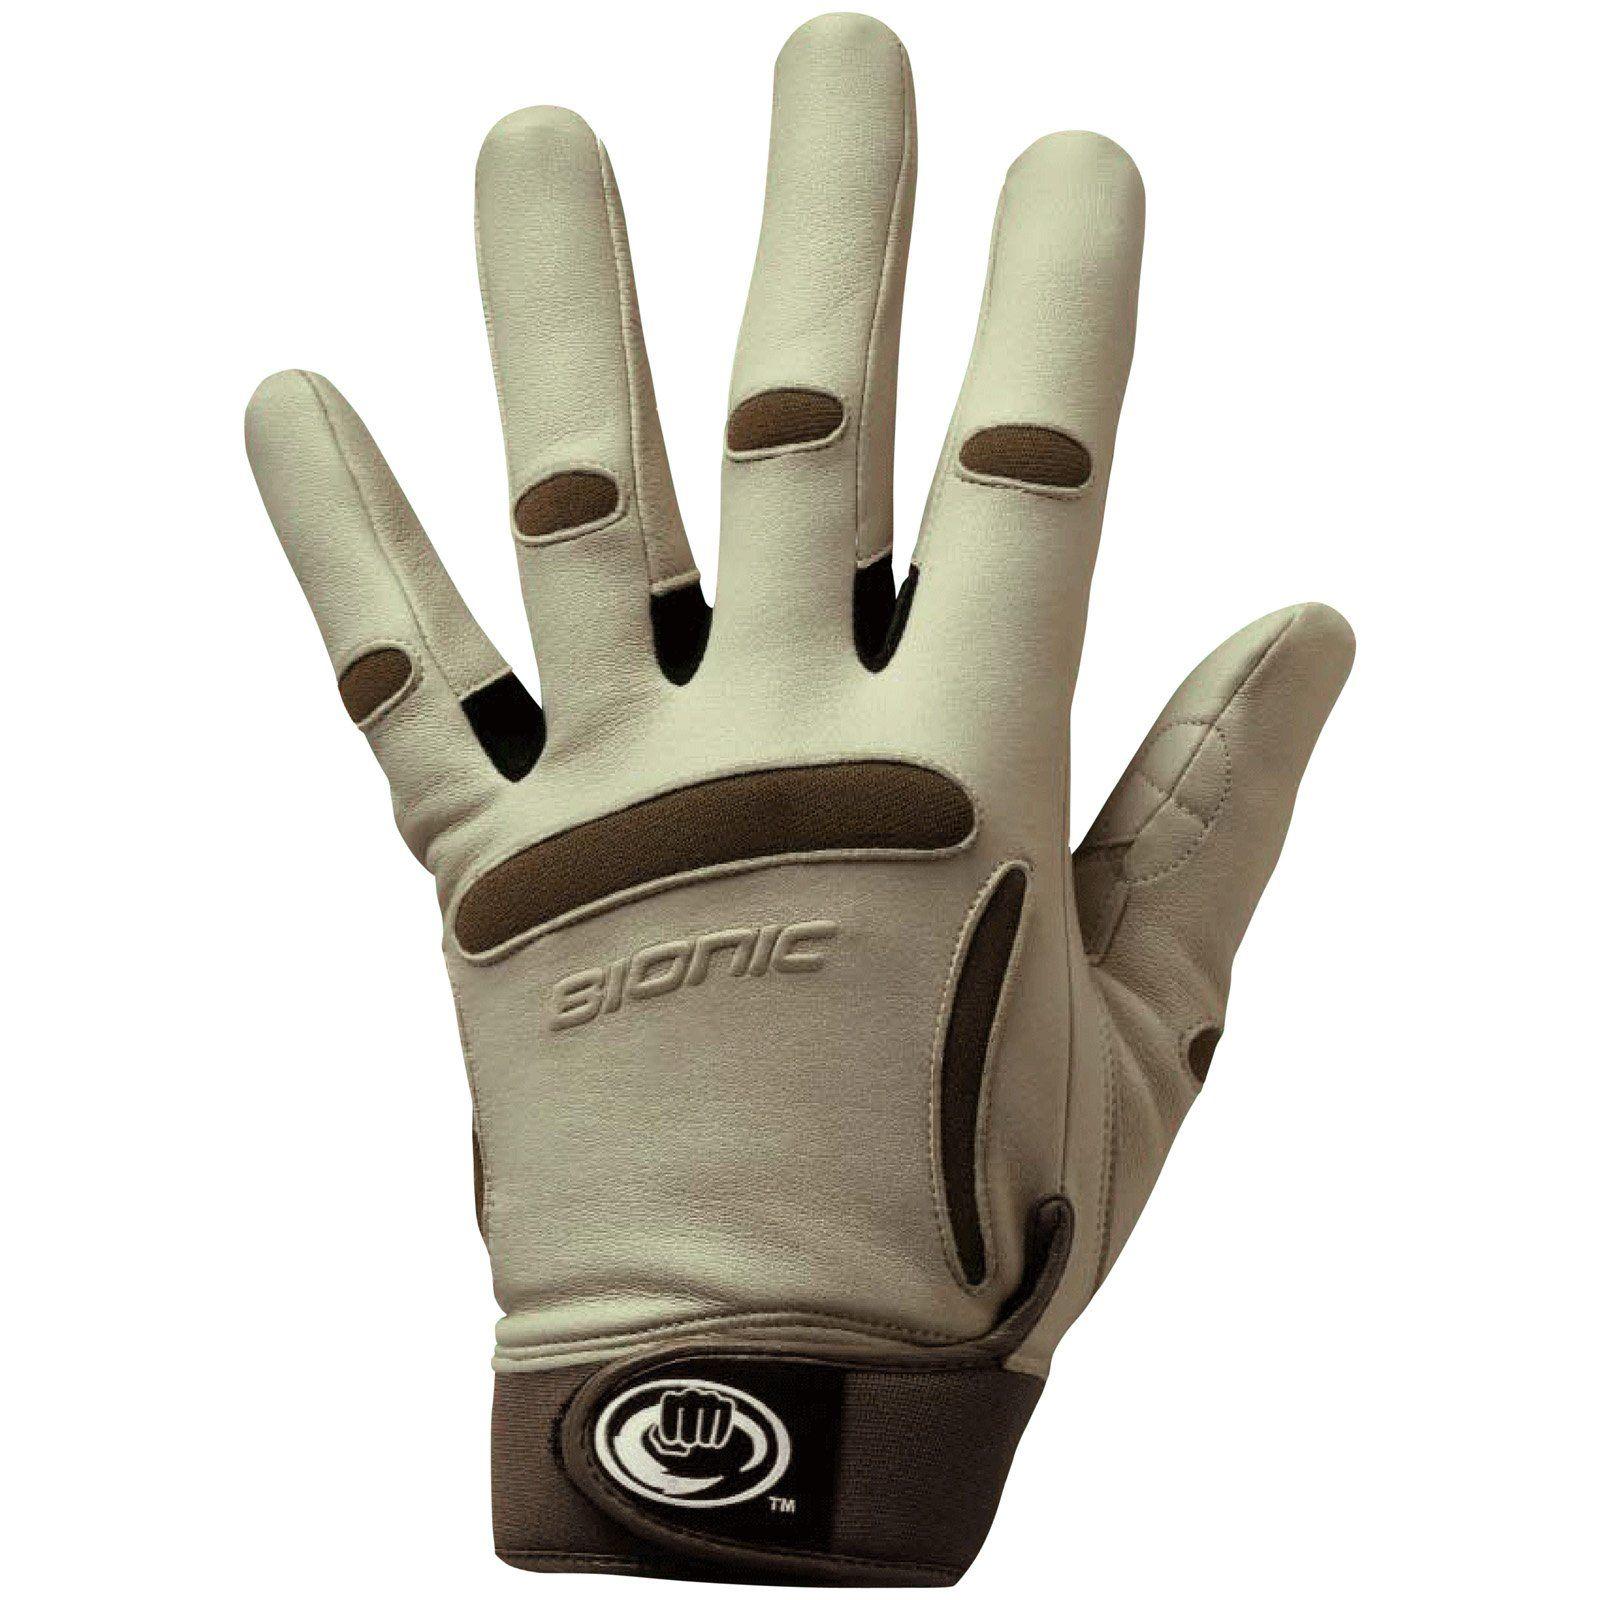 Bionic Womenu0027s Gardening Gloves At Brookstone